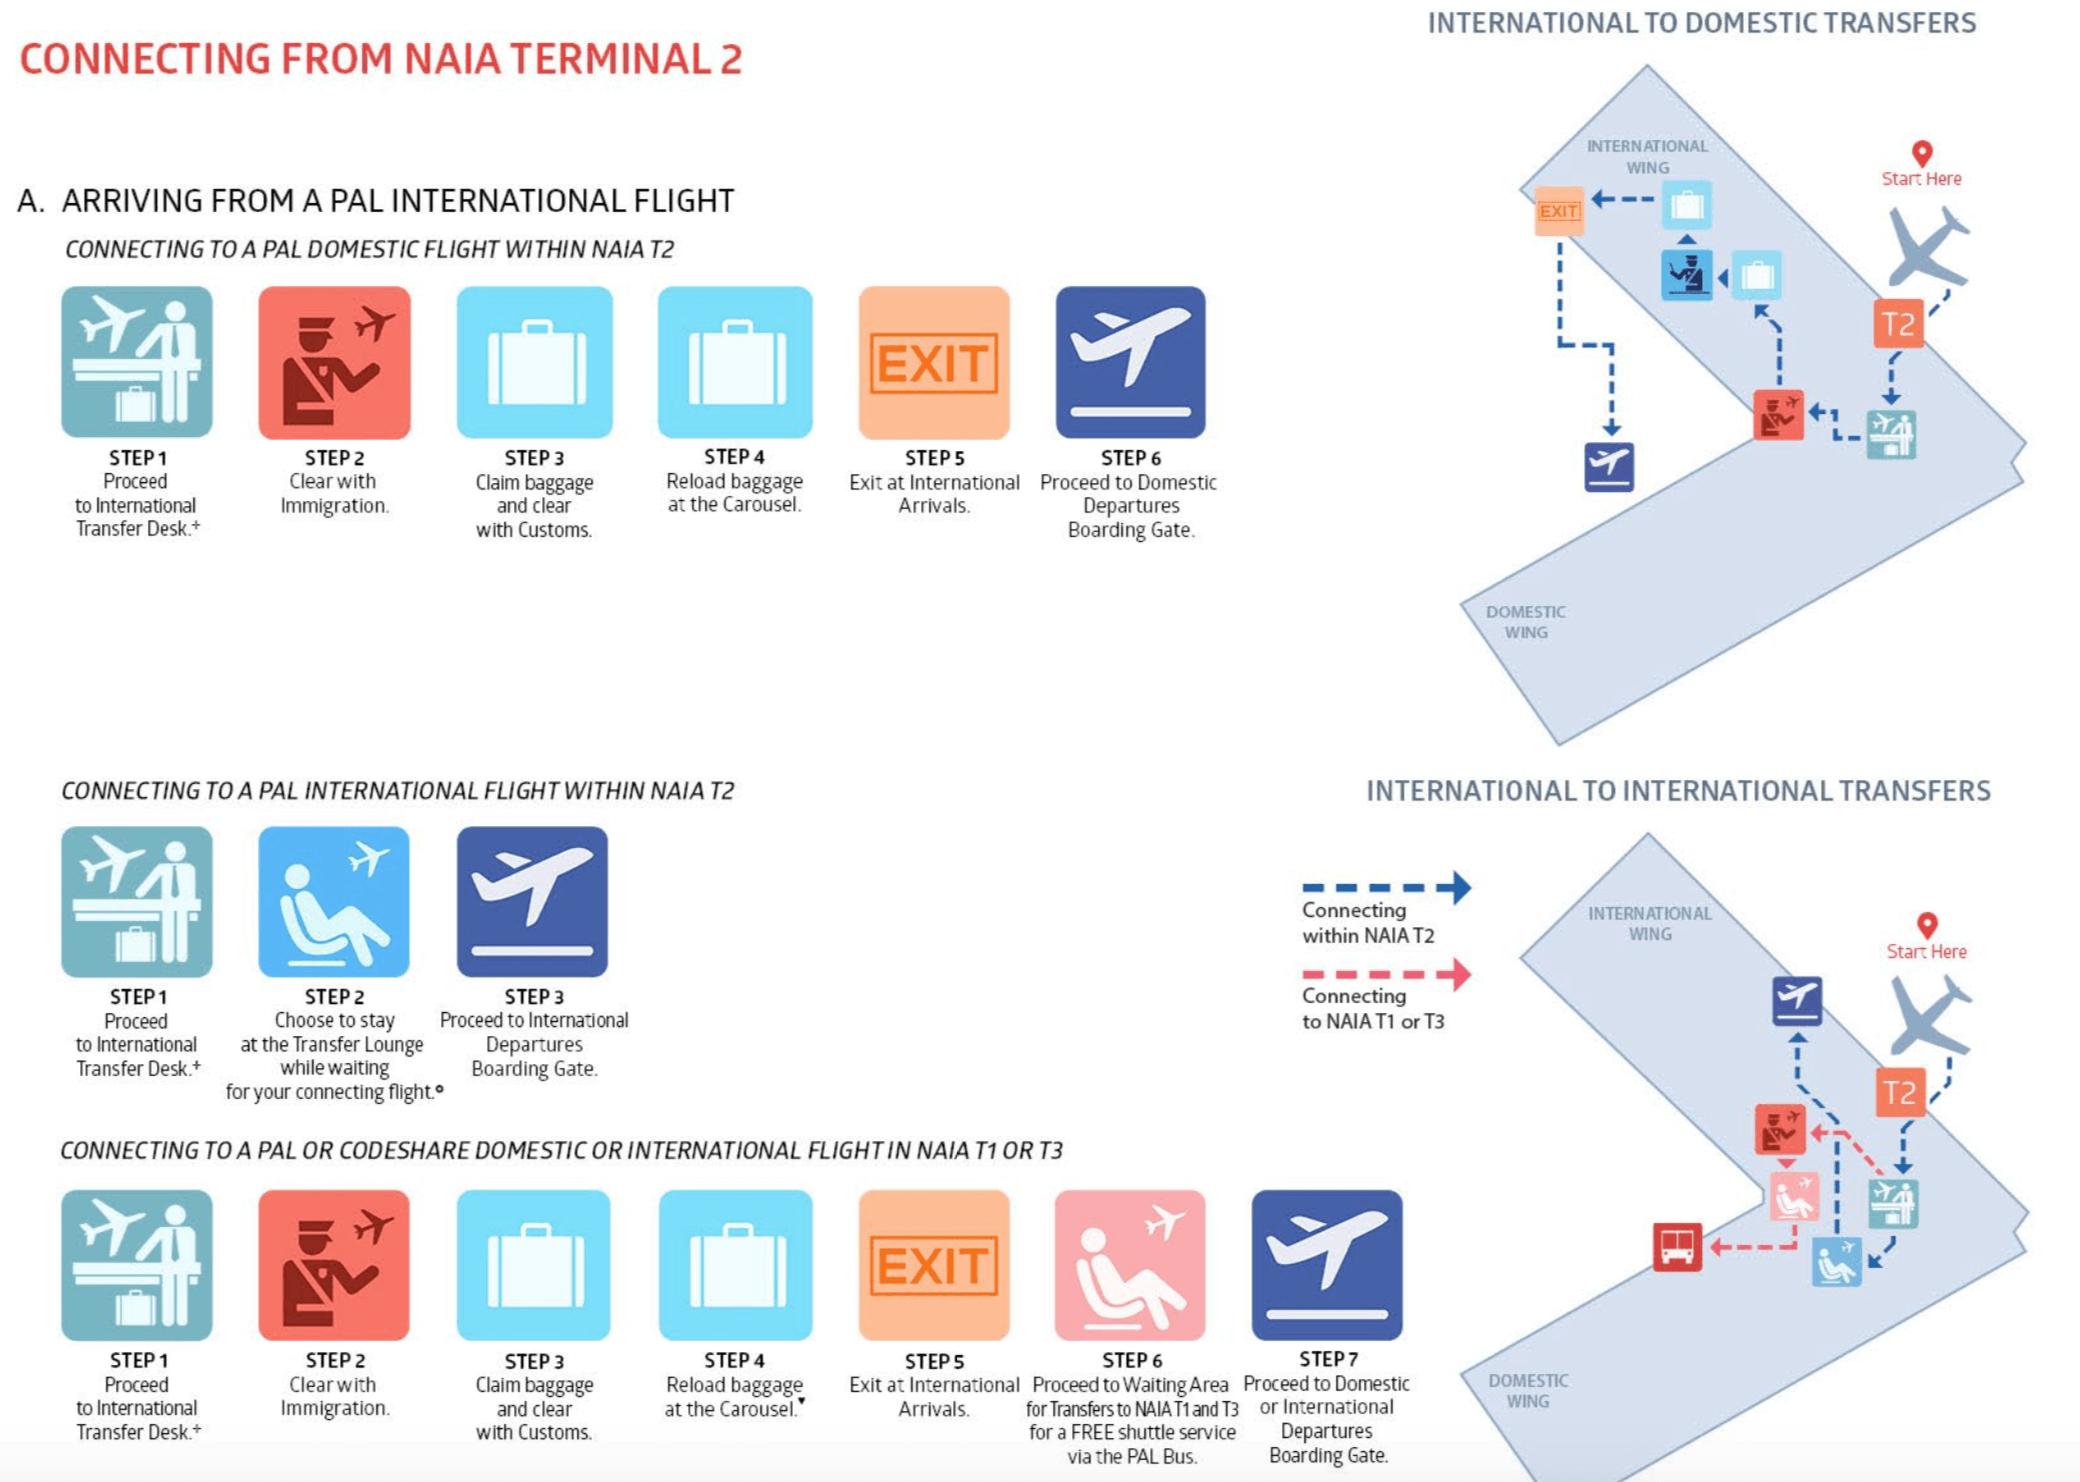 Anschluss vom NAIA Terminal 2